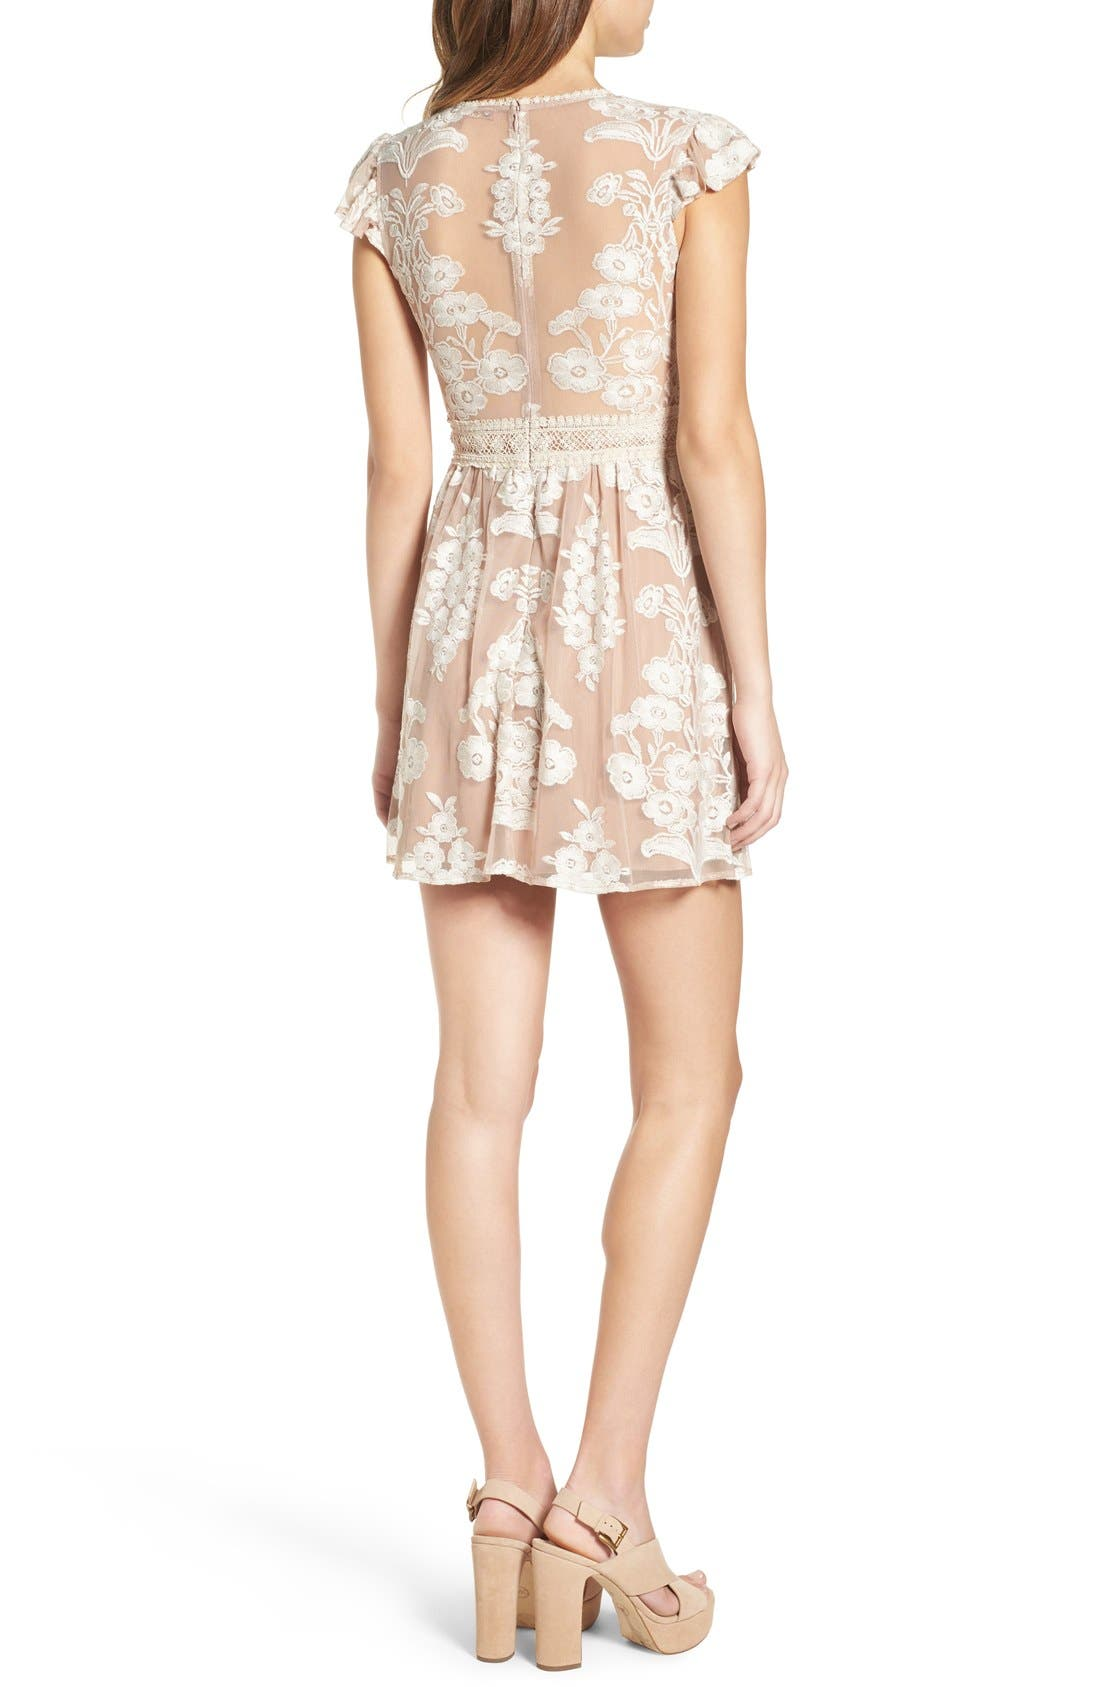 Alternate Image 3  - For Love & Lemons x Nordstrom 'Salud' Embroidered Mesh Minidress (Nordstrom Exclusive)